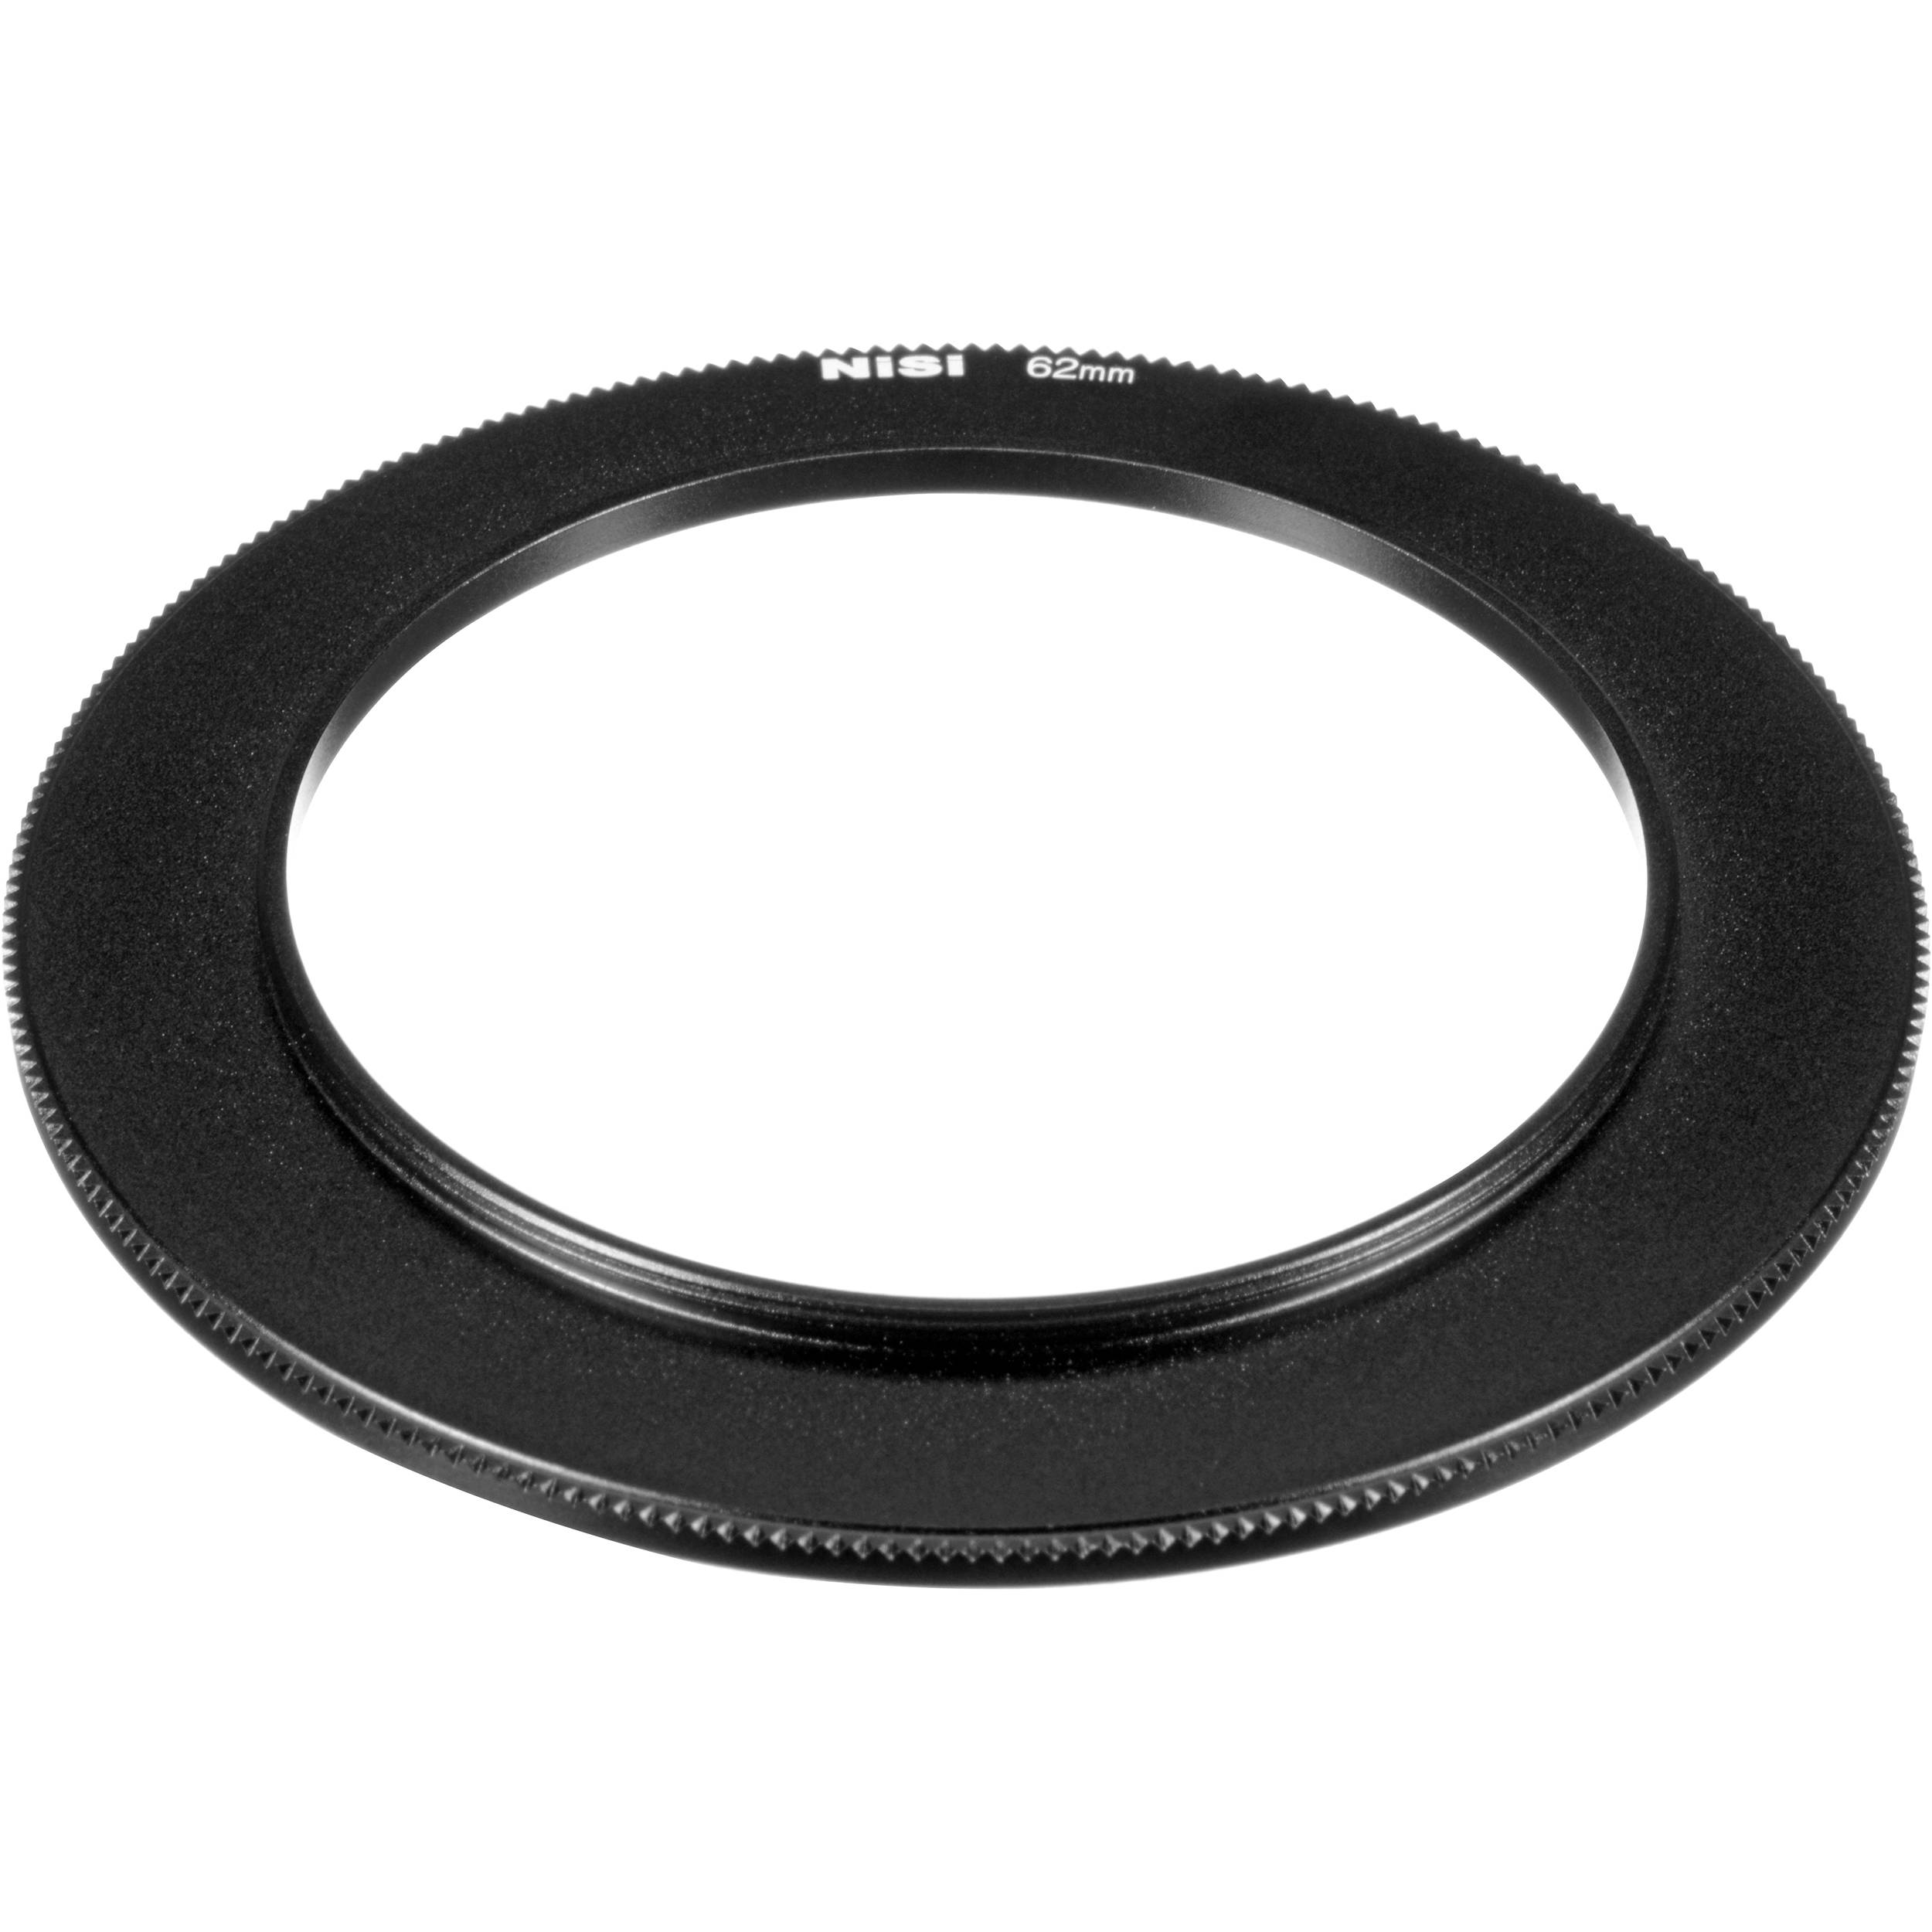 Nisi 62 82mm Step Up Ring For C4 Cinema Filter Nip V5 Ad62 Bh 100mm Aluminium Holder Kit Pro And